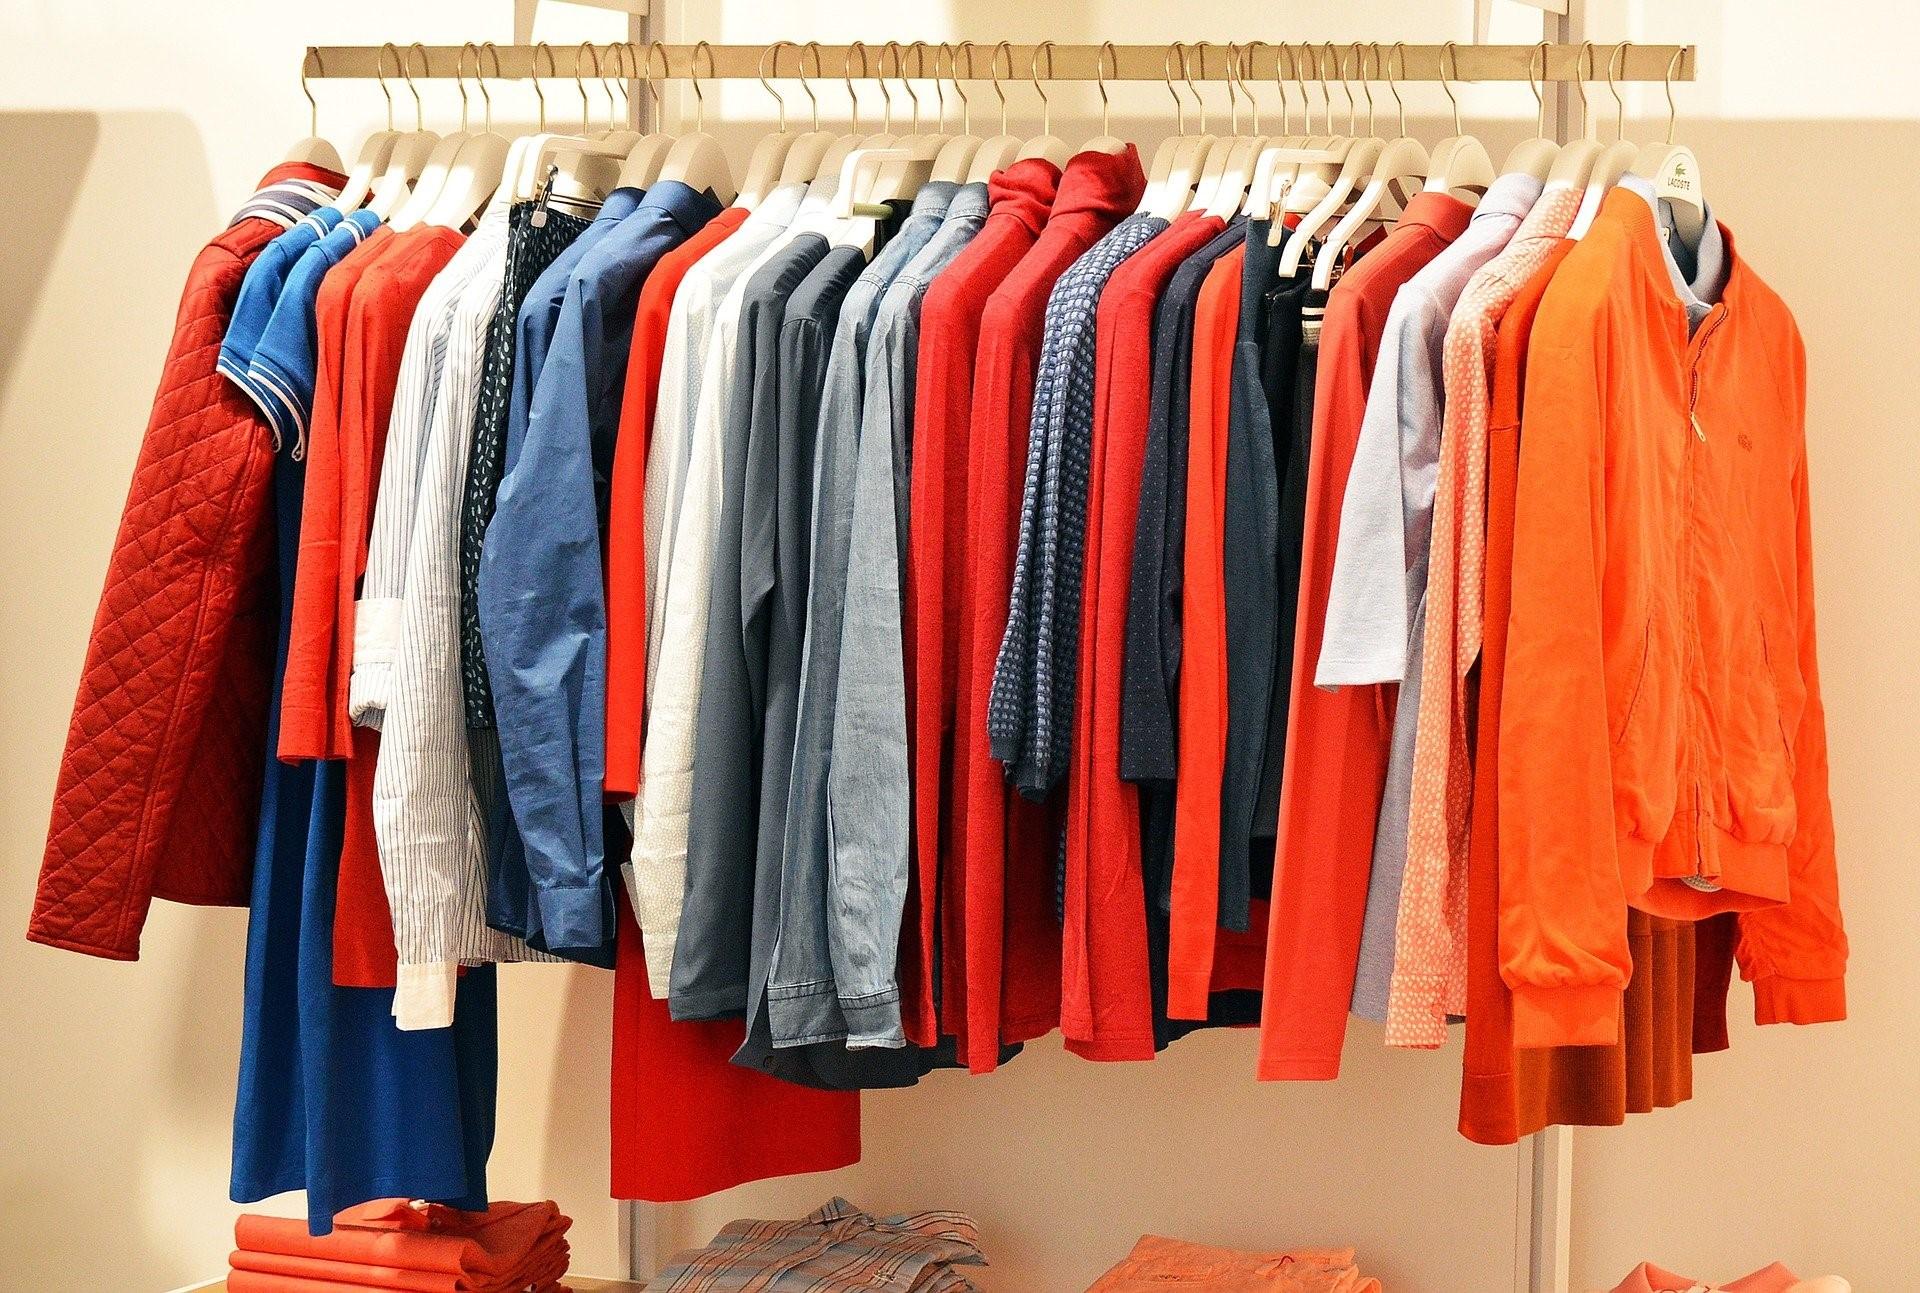 Multiple shirts hanging